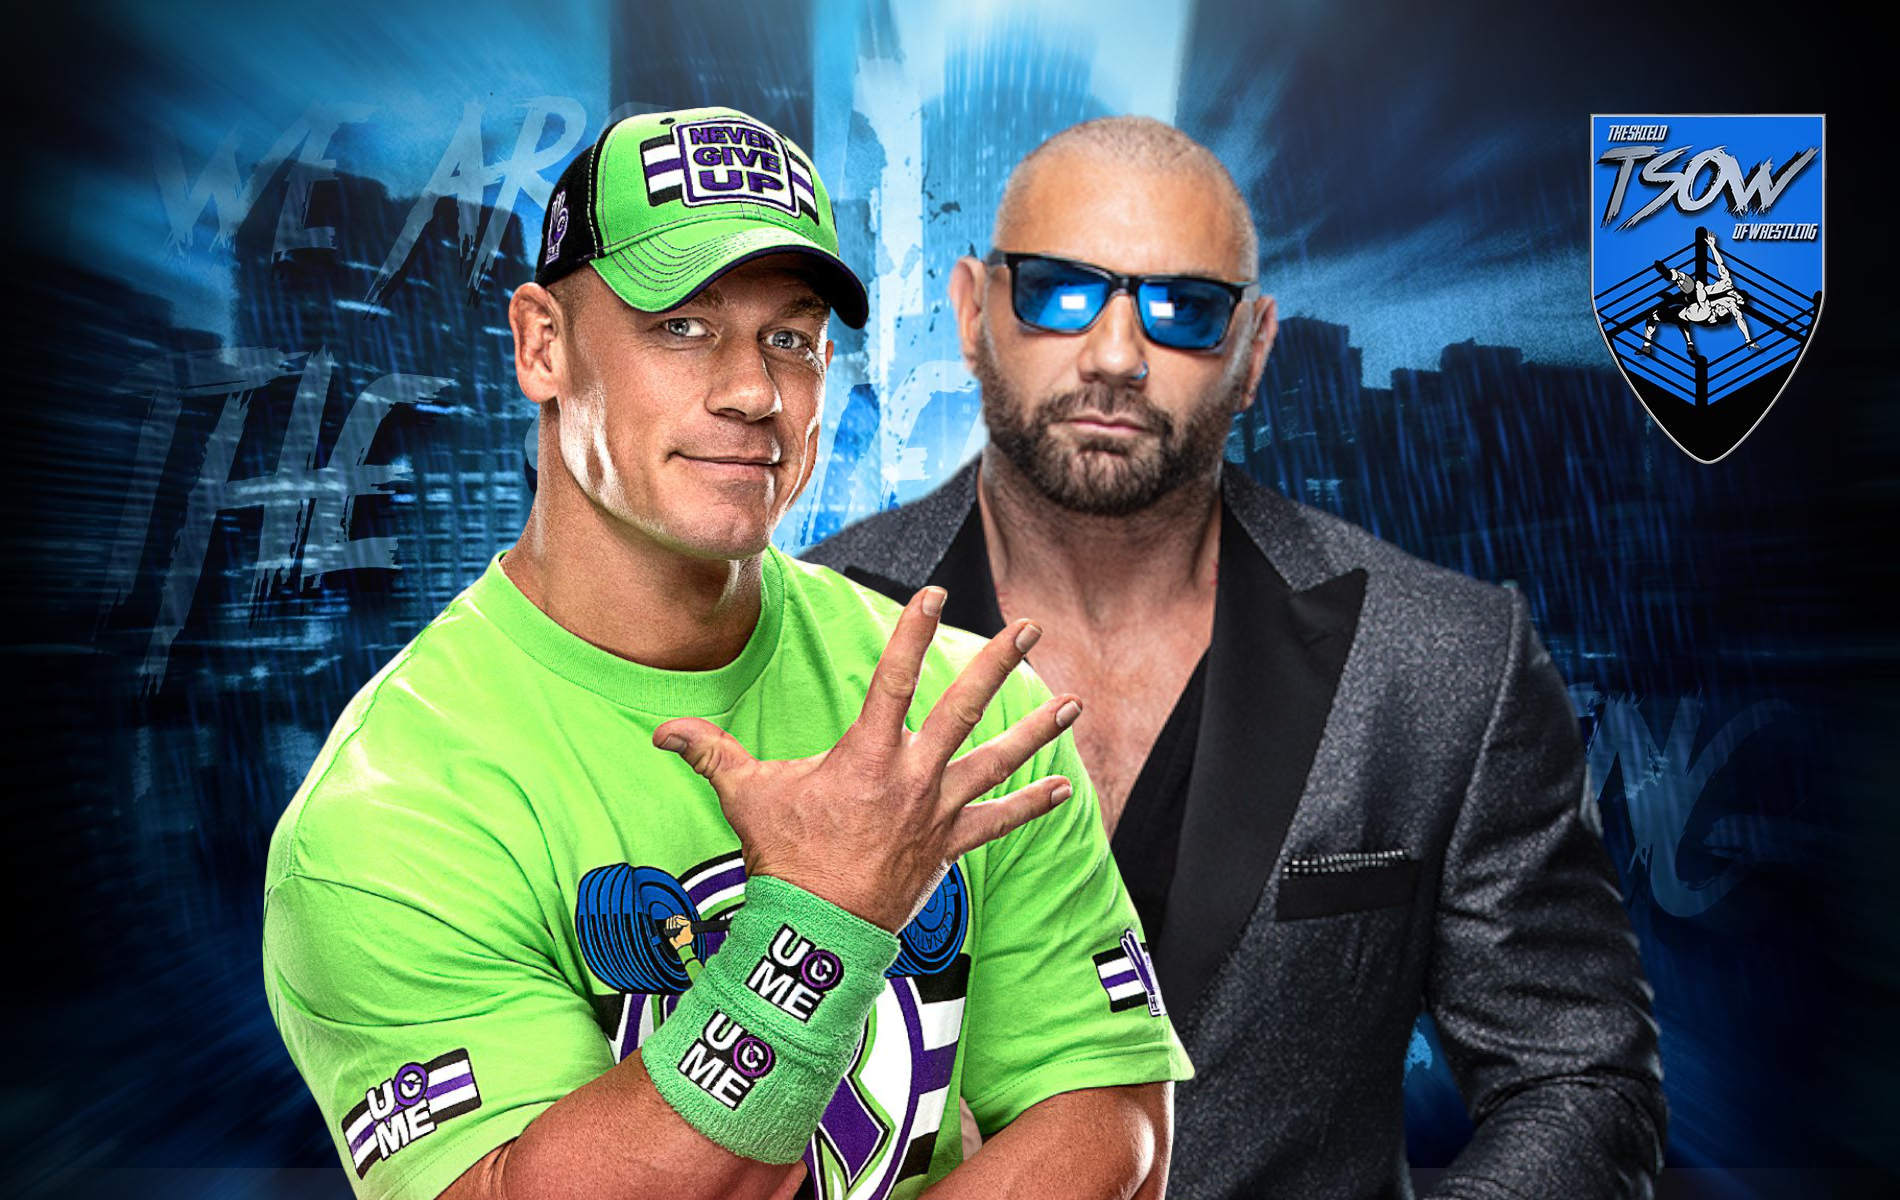 John Cena e Batista protagonisti di due spot al Super Bowl